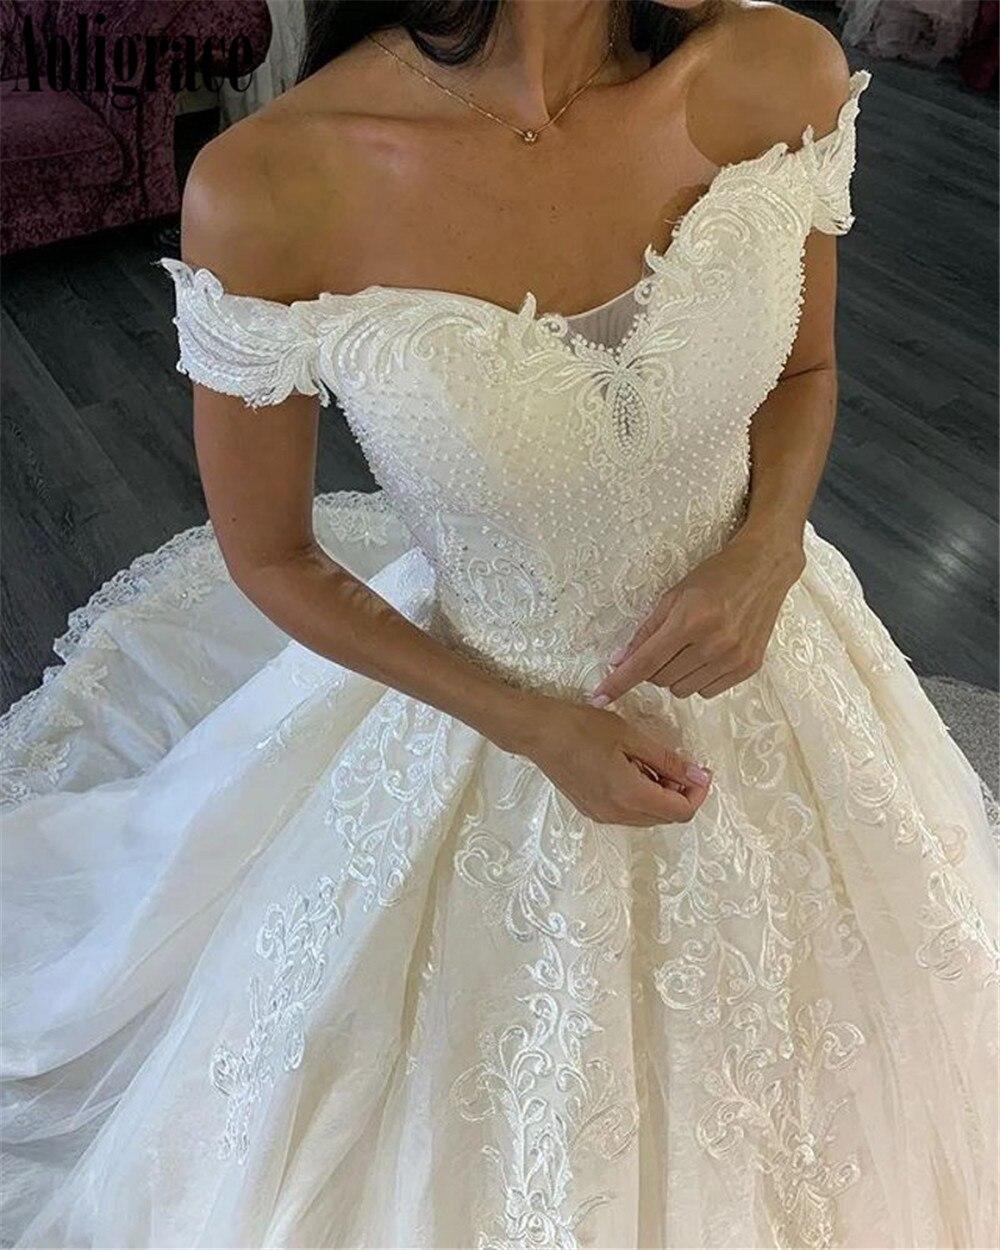 Lace Off Shoulder Wedding Dresses For Bride Appliques Sweep Train Country Bridal Gowns Plus Size Church Vestidoe De Noiva Custom